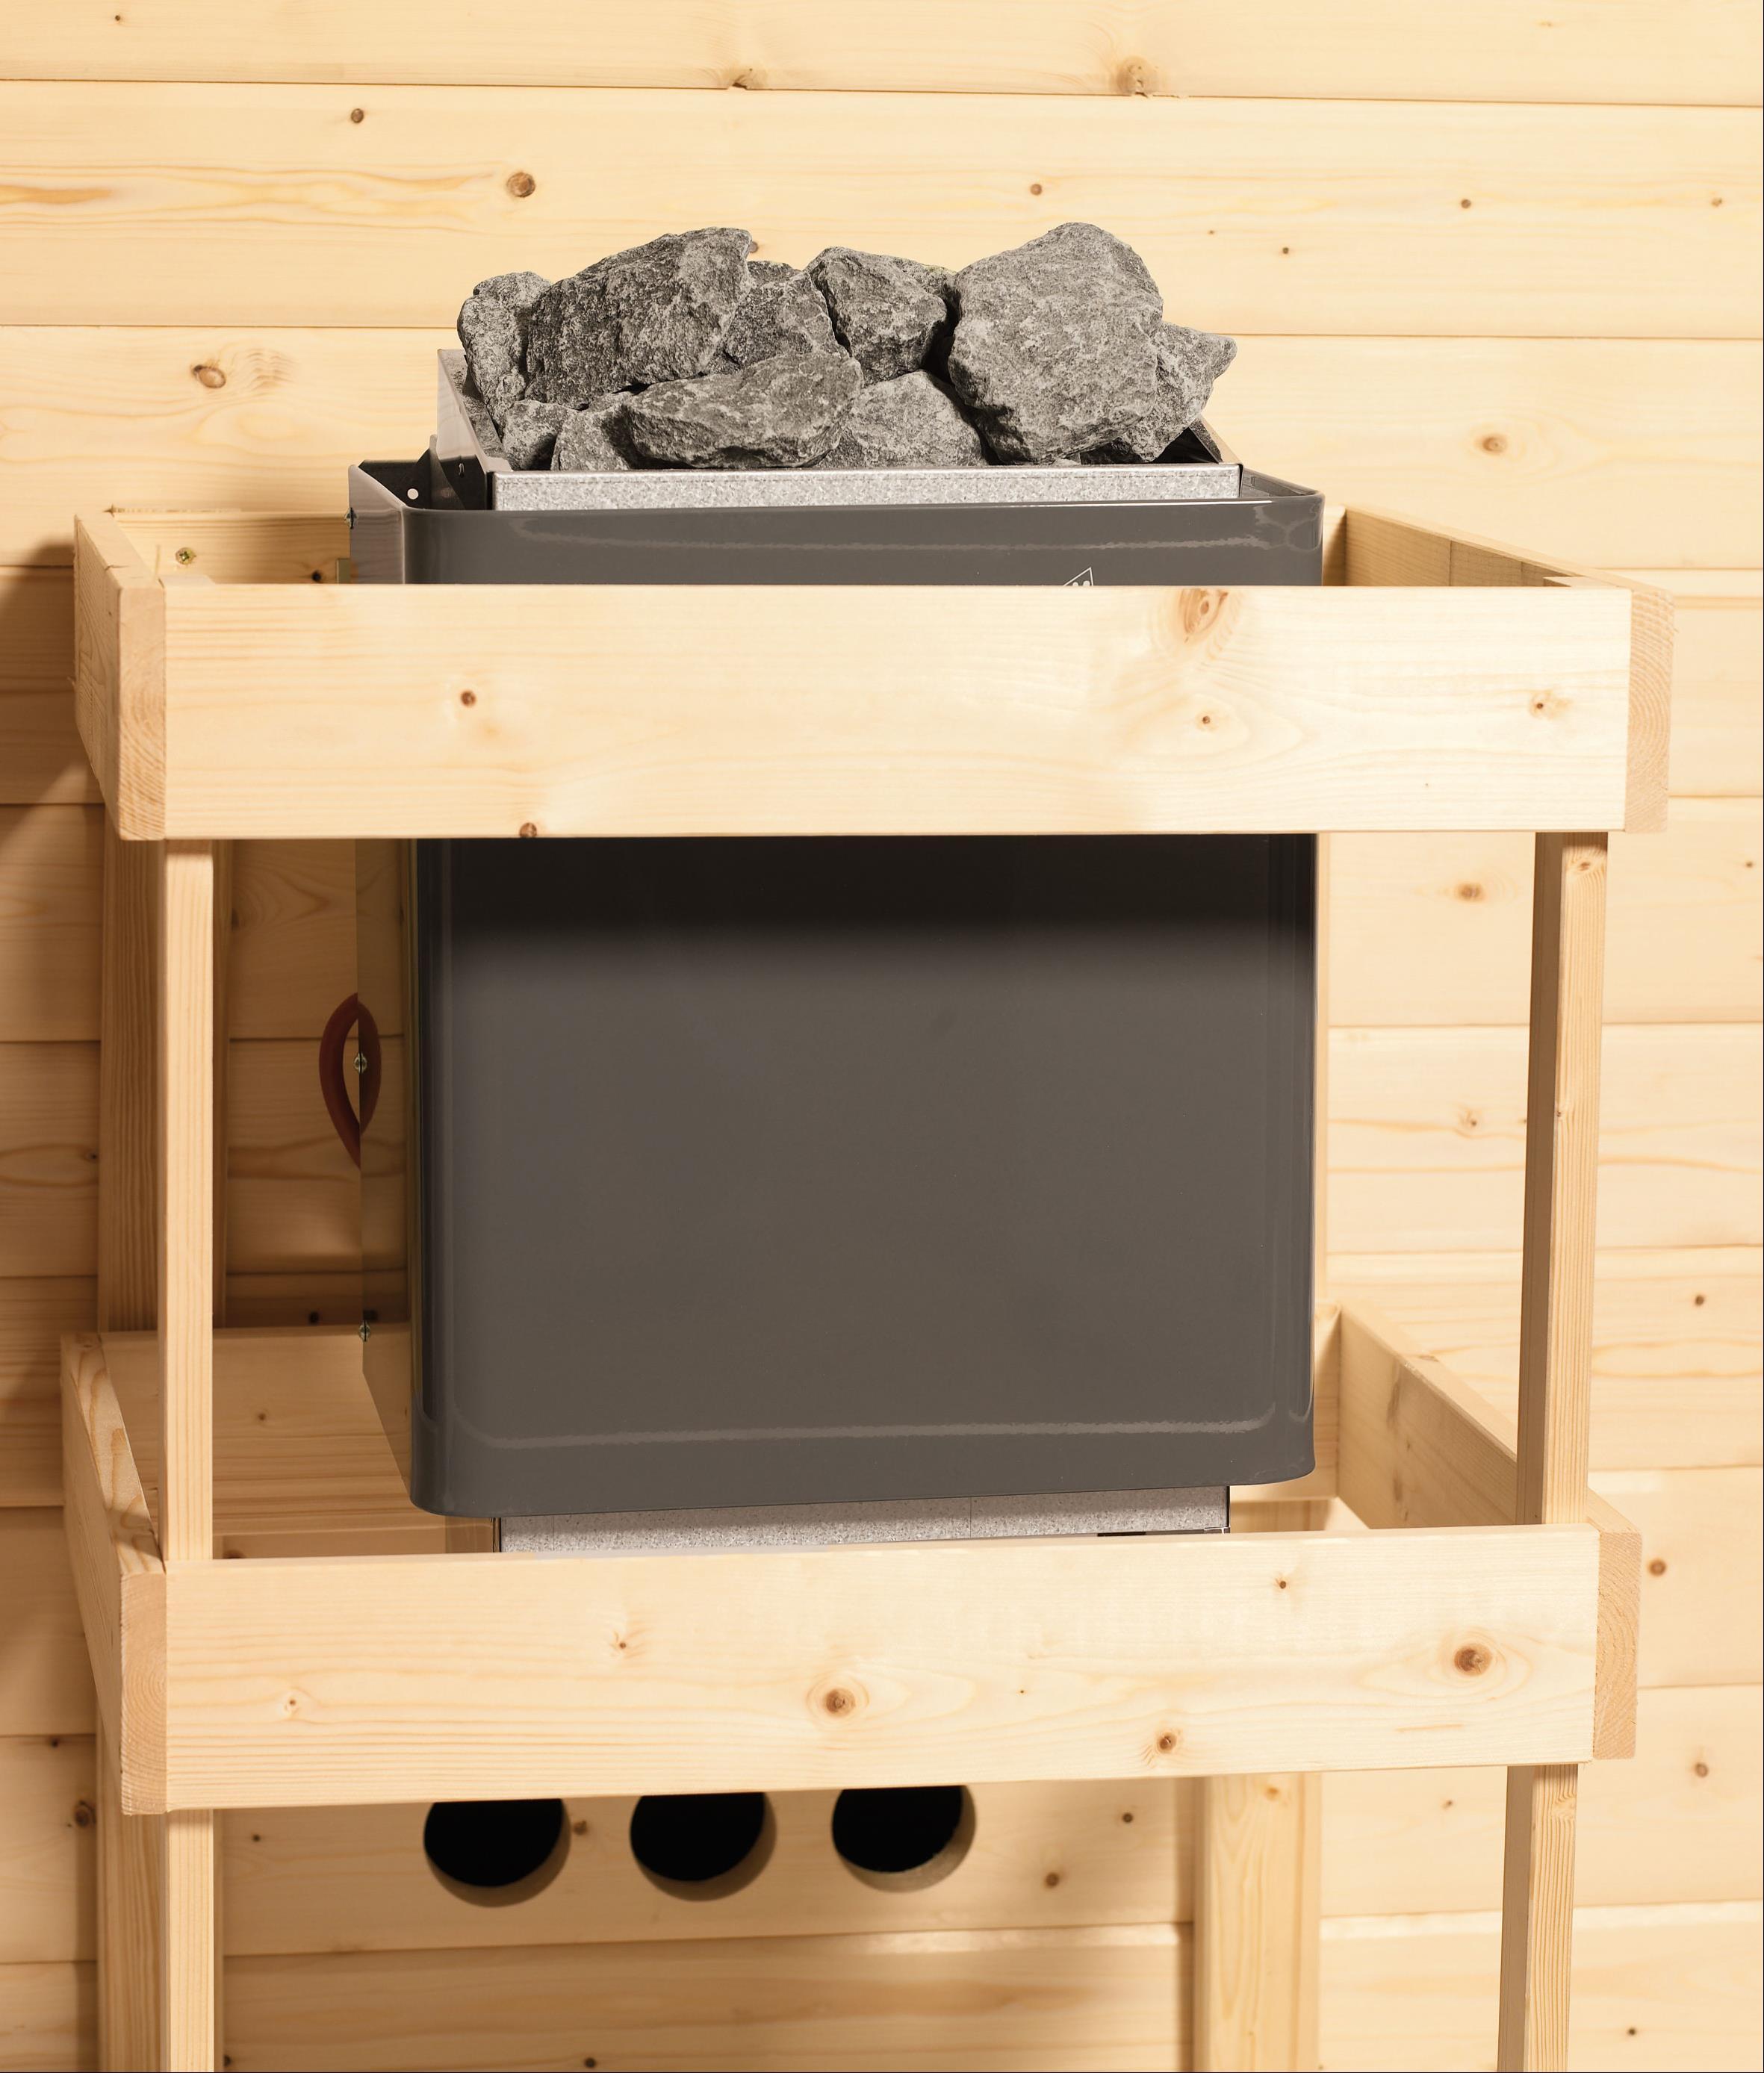 Woodfeeling Sauna Leona 38mm Kranz Ofen Bio 9kW Tür Classic Bild 10